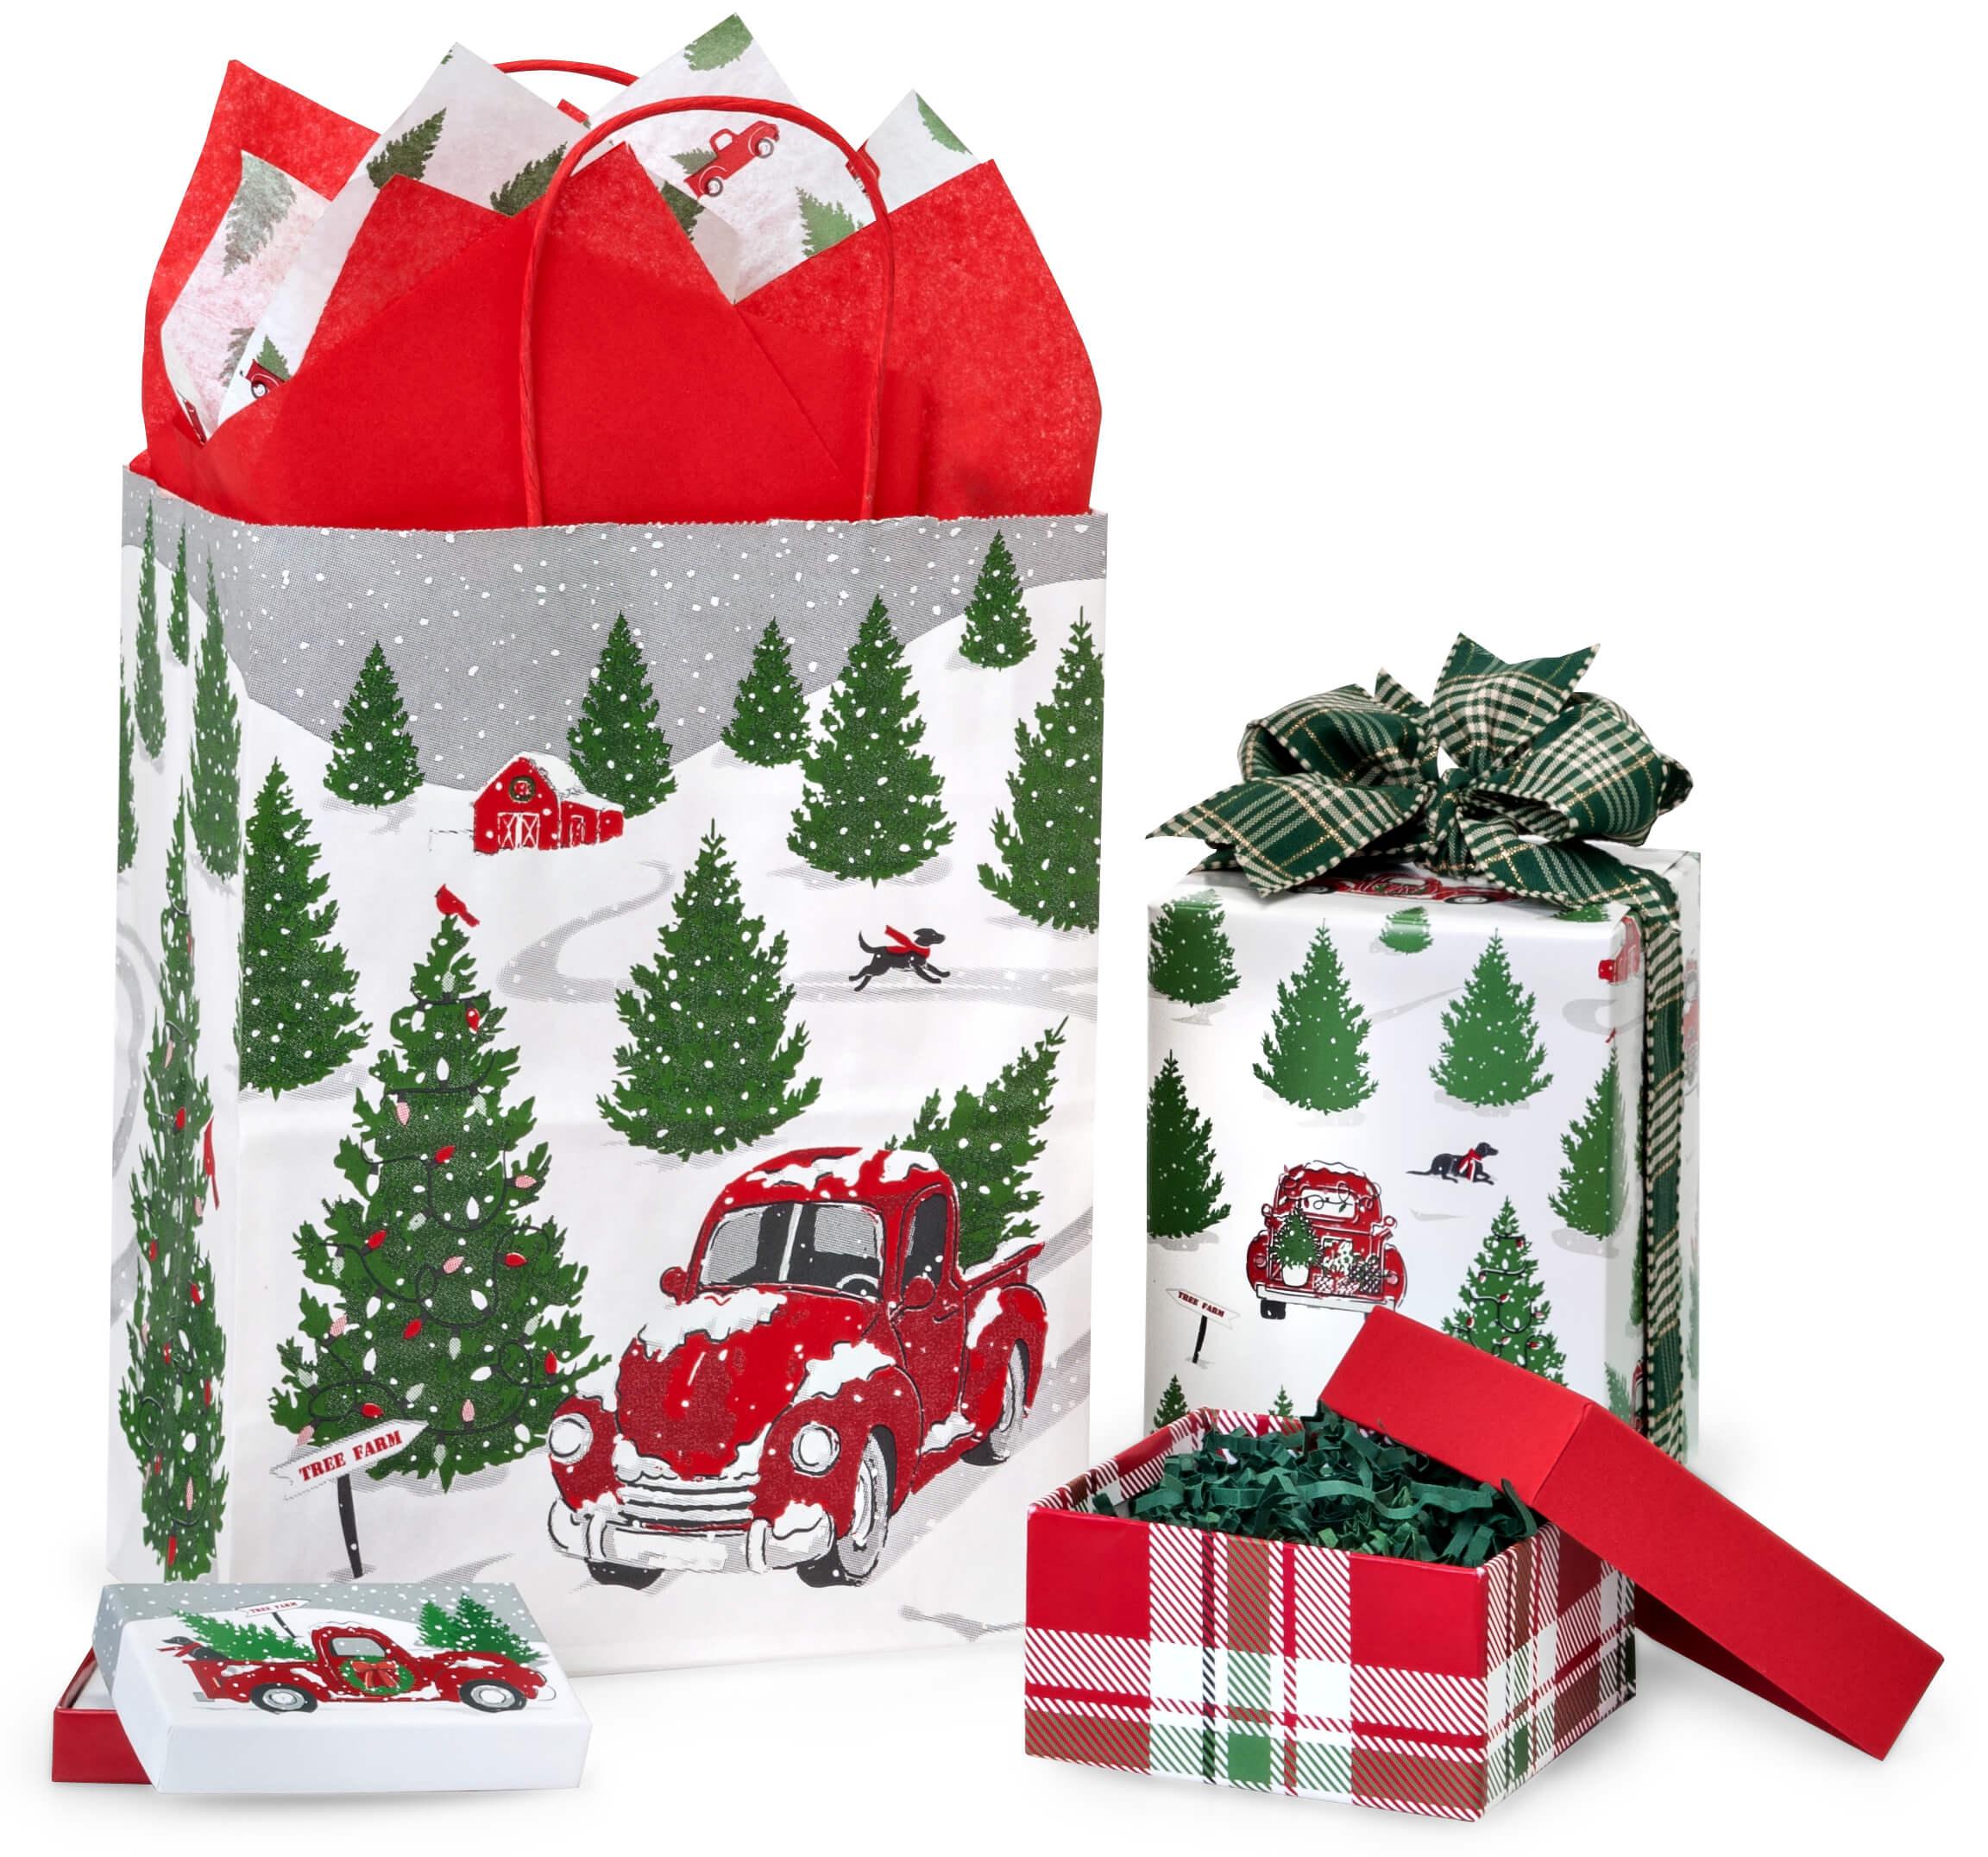 Christmas In Evergreen Truck.It S A Wonderful Season Tree Farm Christmas Truck